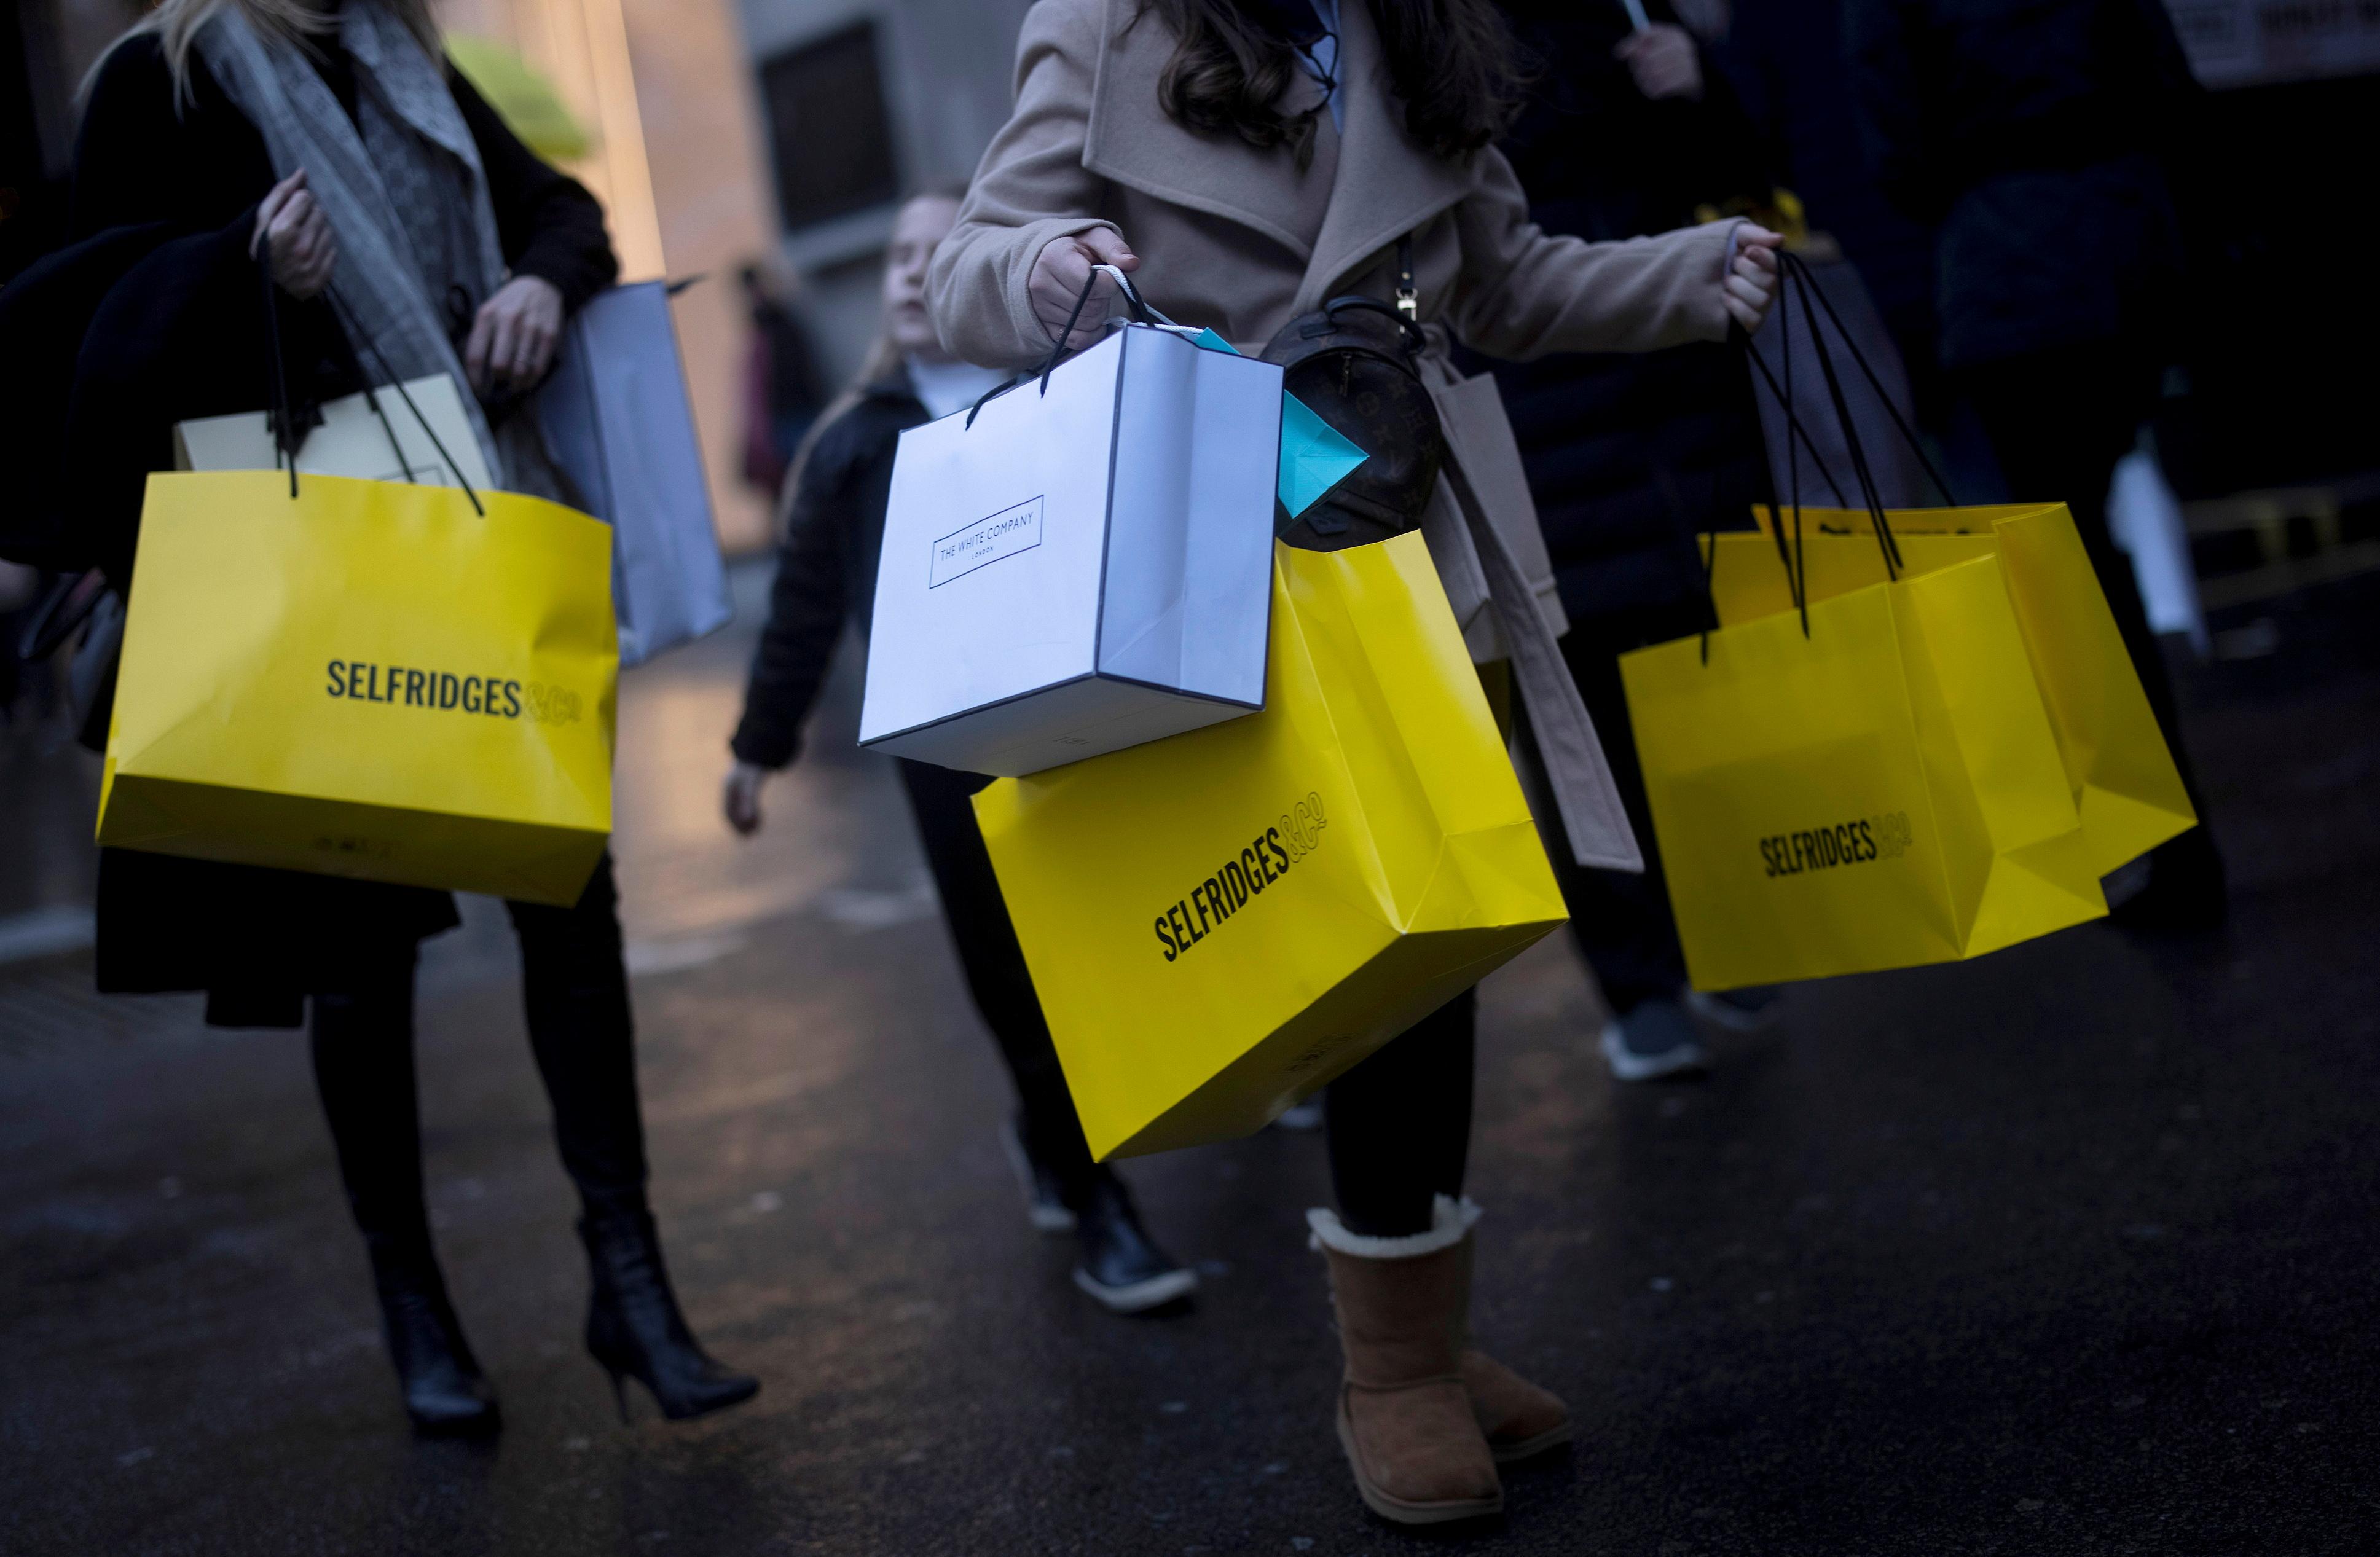 Shoppers walk down Oxford Street, amid the coronavirus disease (COVID-19) outbreak in London, Britain, December 13, 2020. REUTERS/Simon Dawson/File Photo